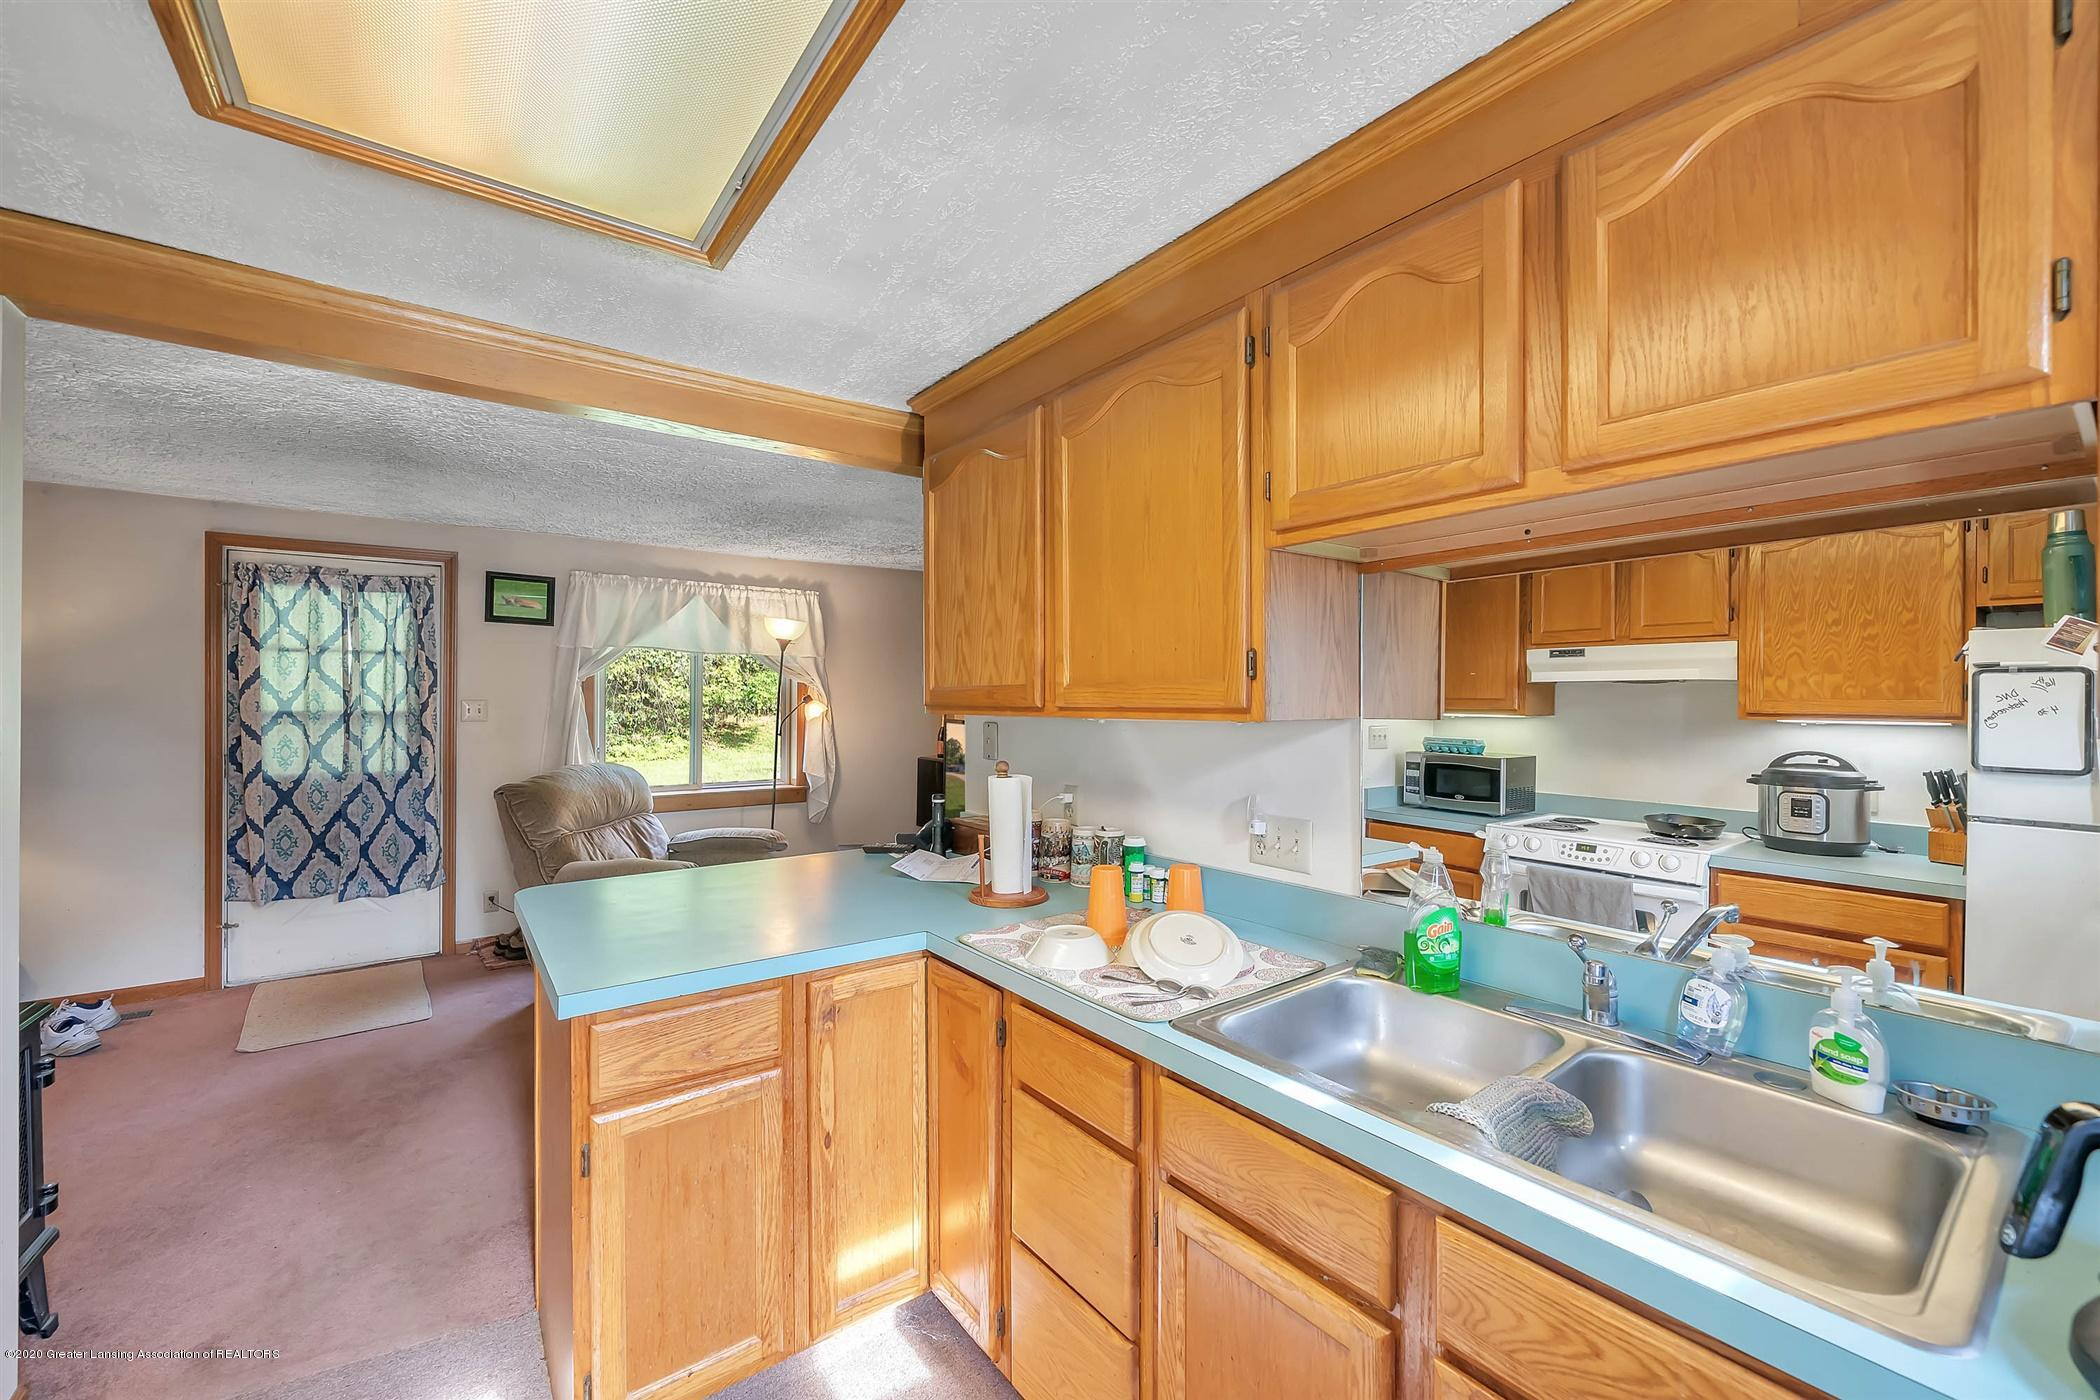 6750 W Lovejoy Rd - (36) 6758 Lovejoy Kitchen - 36